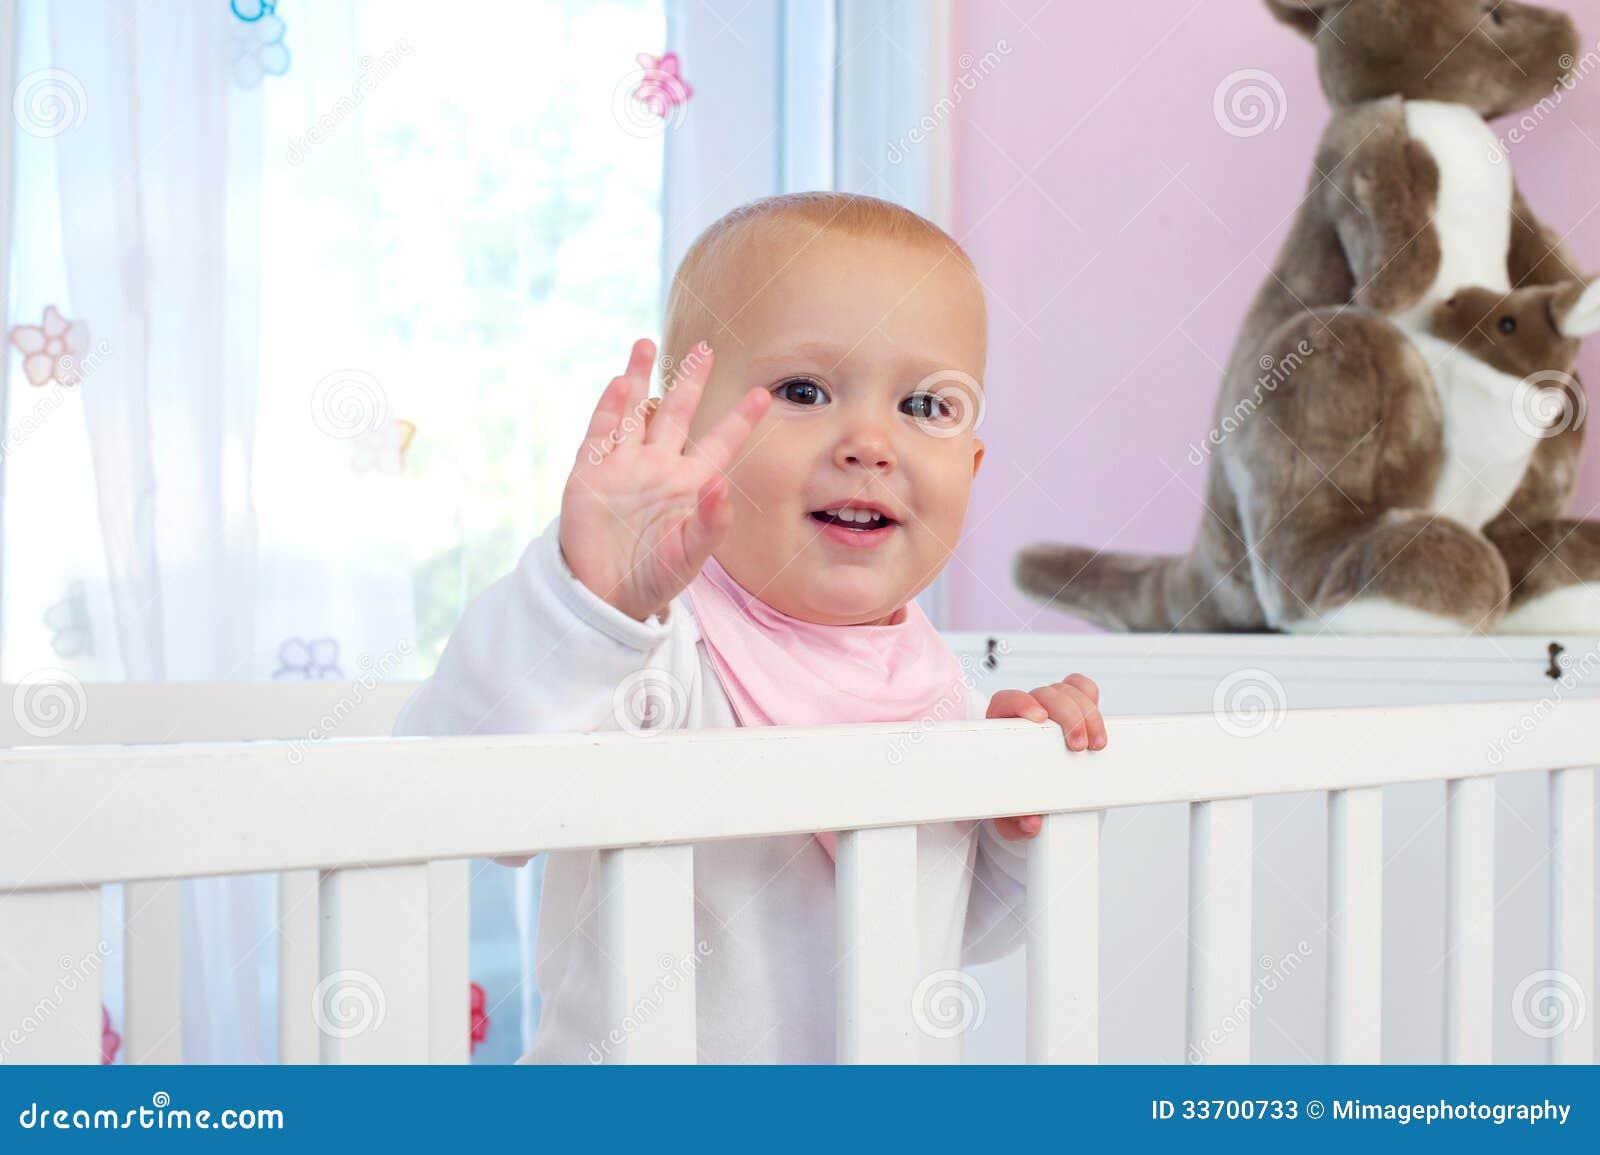 Child waving hello smiling and waving hello